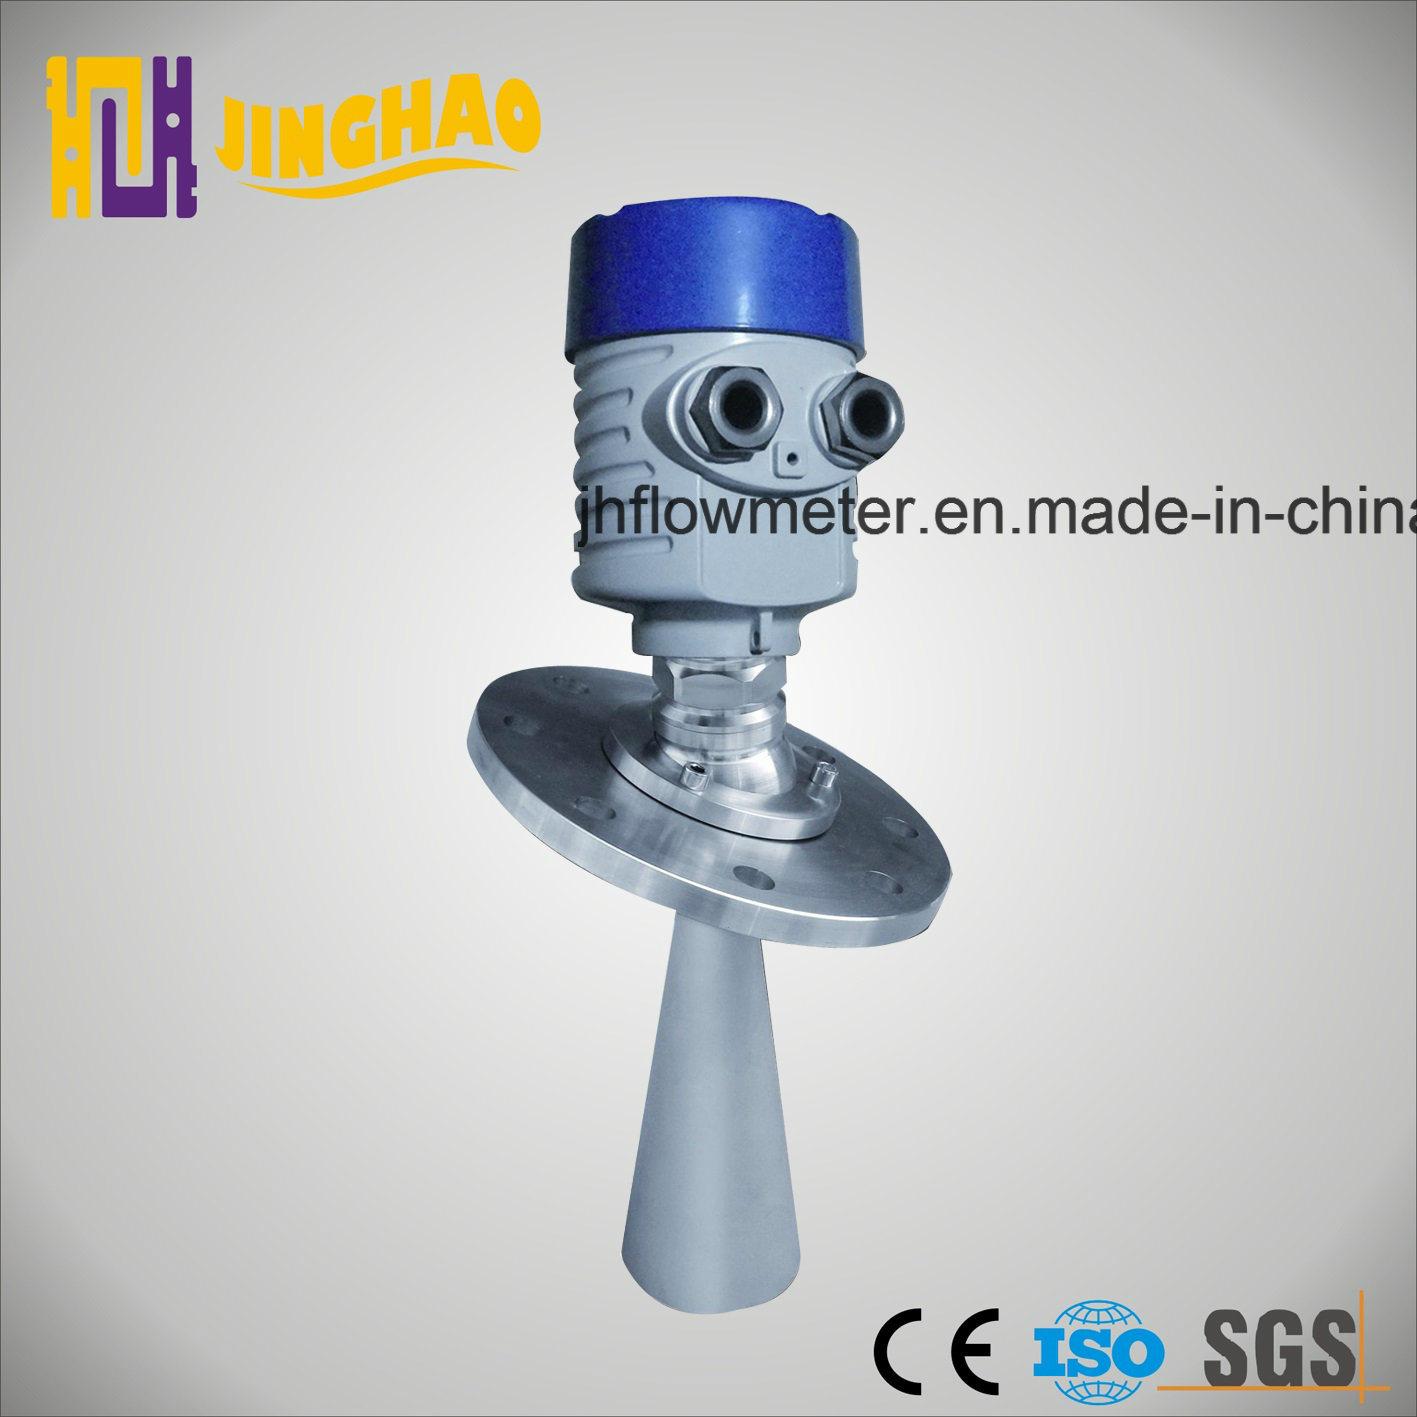 Hot Sale Radar Level Meter, Level Transmitter, Level Sensor (JH-RD-808)